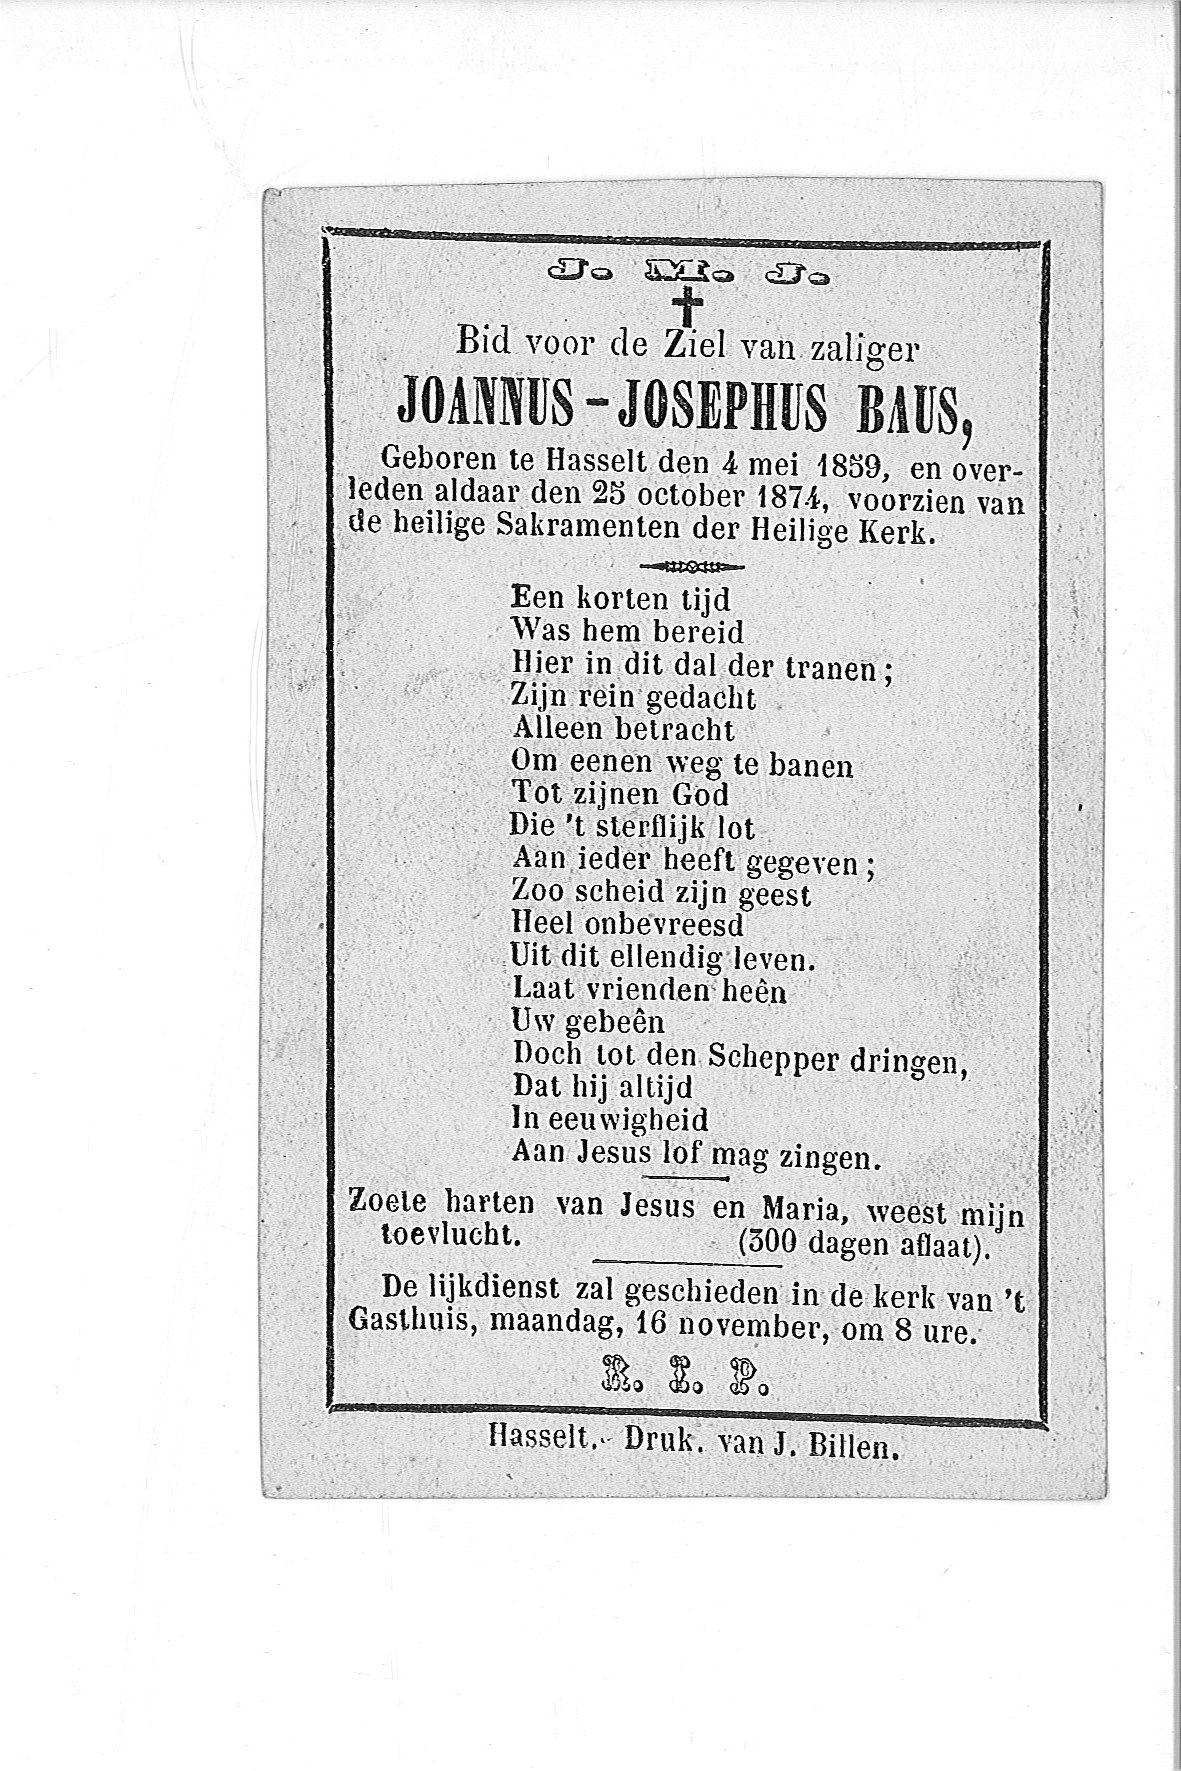 joannus-josephus(1875)20090709113558_00032.jpg